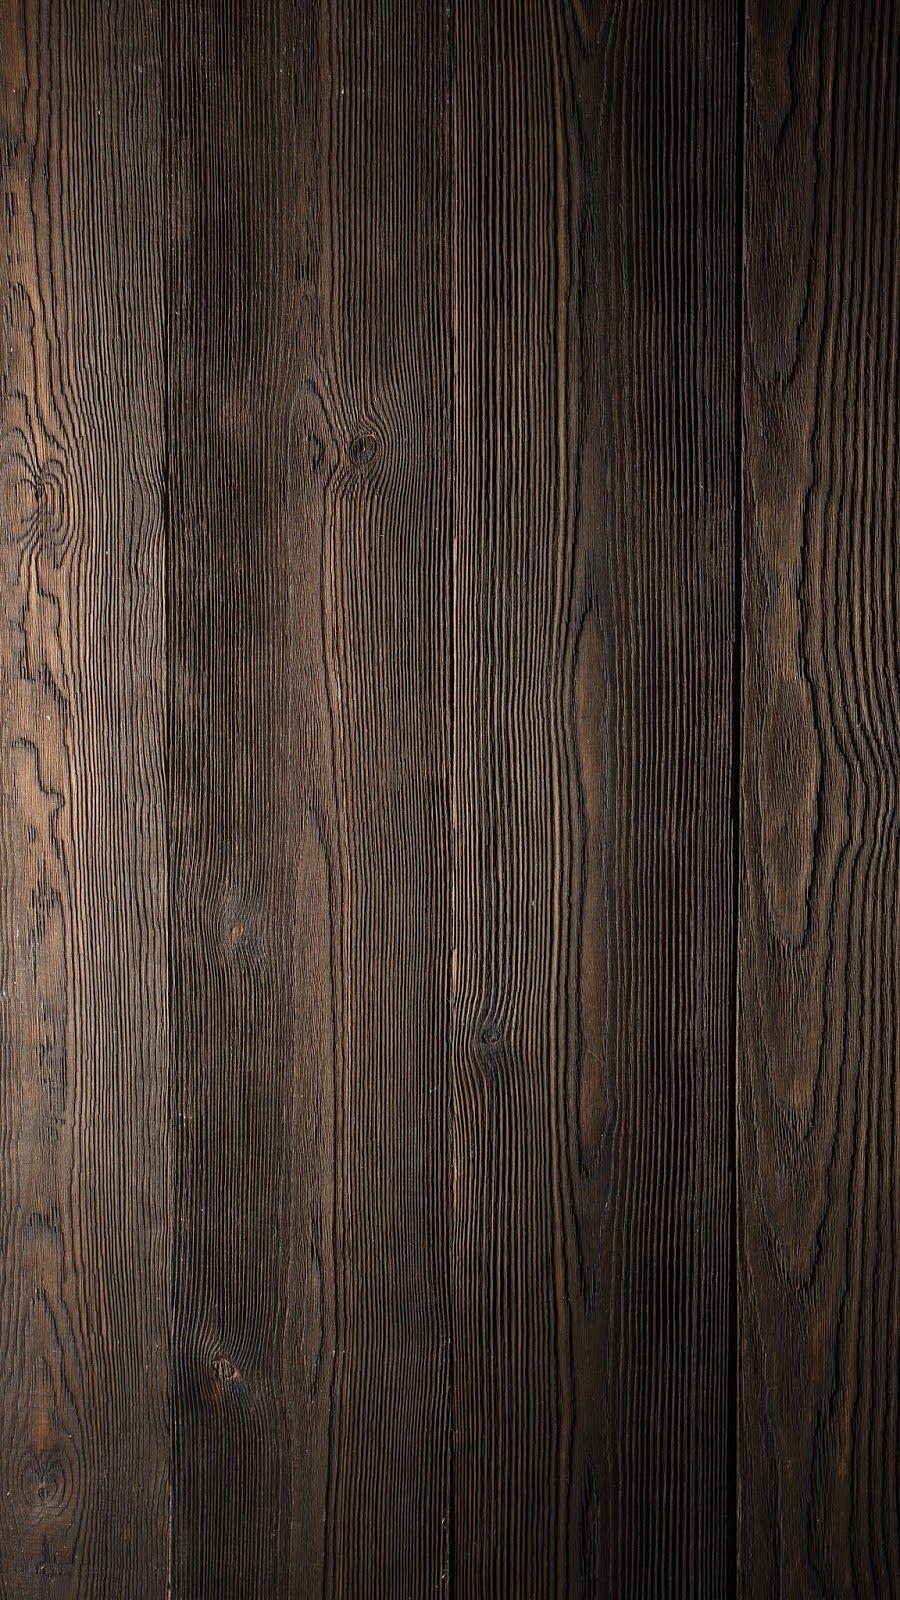 Aged Grey Planks Wallpaper Mural Murals Wallpaper Wood Wallpaper Wood Wallpaper Bedroom Wallpaper Living Room